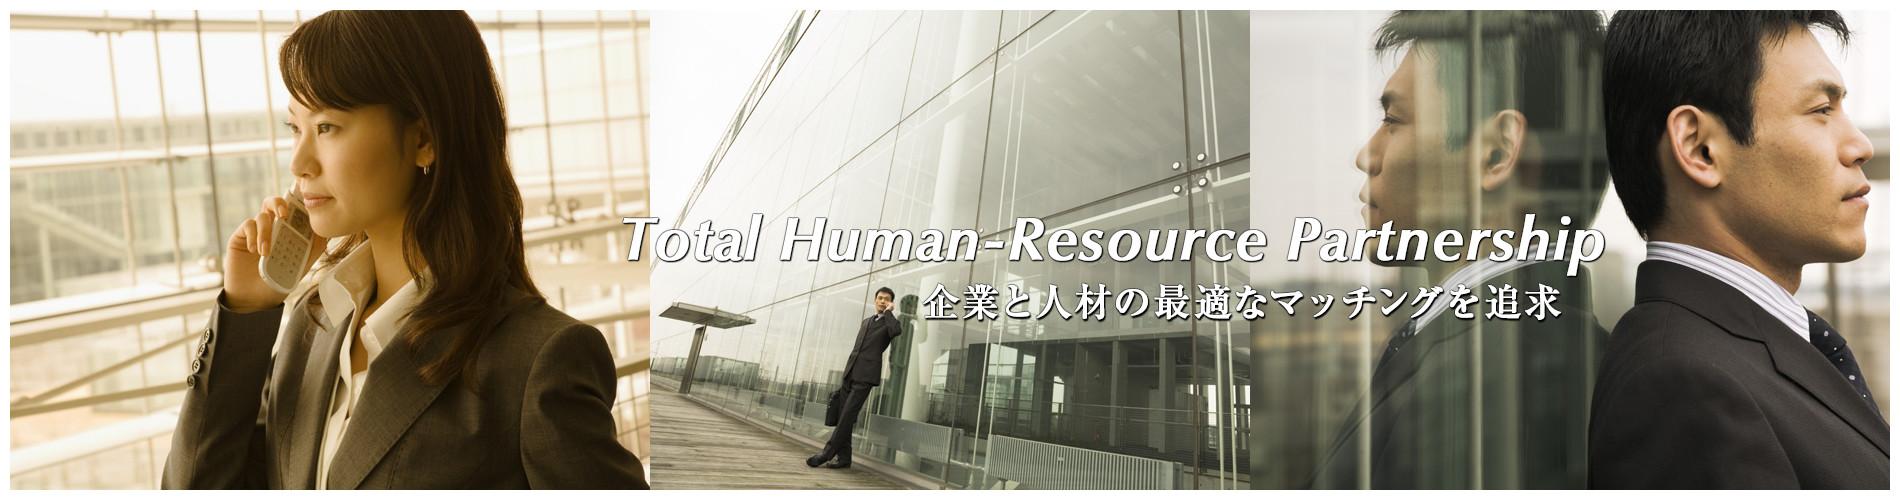 """Total Human-Resource Partnership"" 企業と人材の最適なマッチングを追求"